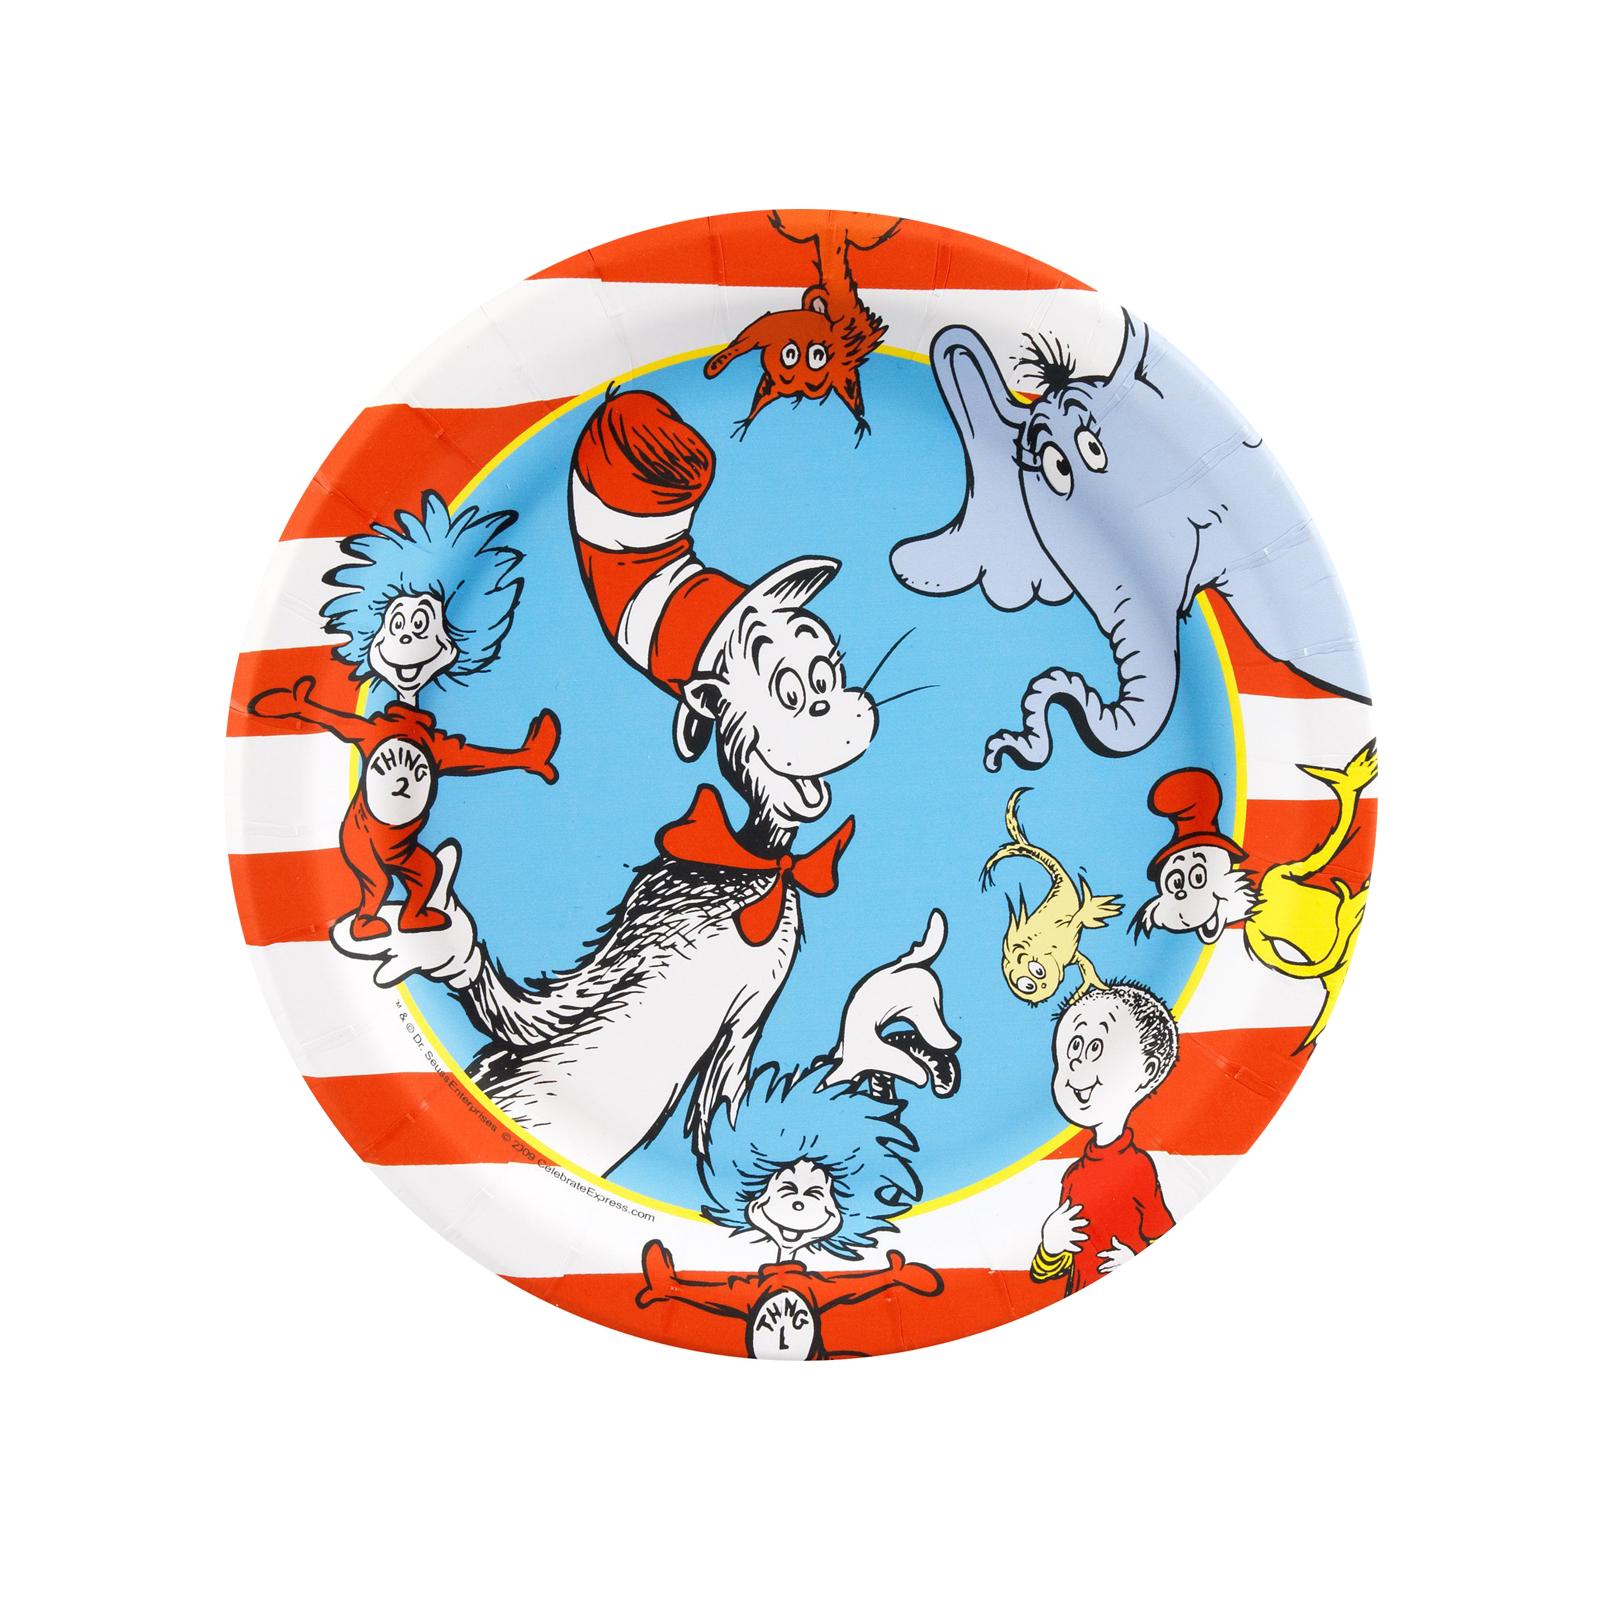 Dr. Seuss Dessert Plates | BirthdayExpress.com